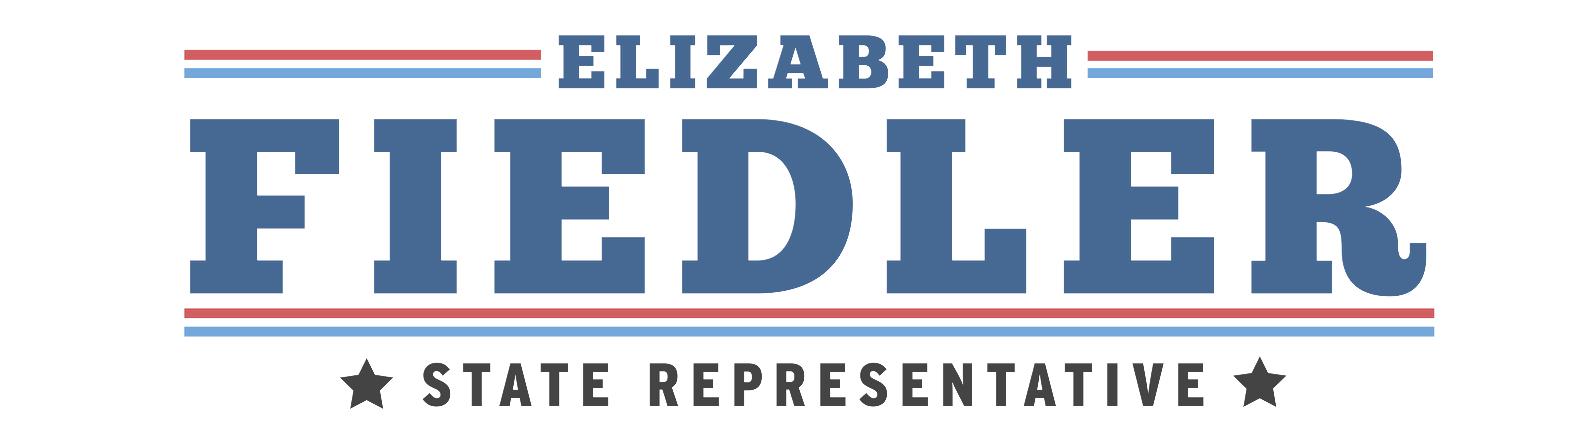 ElizabethFiedler.com